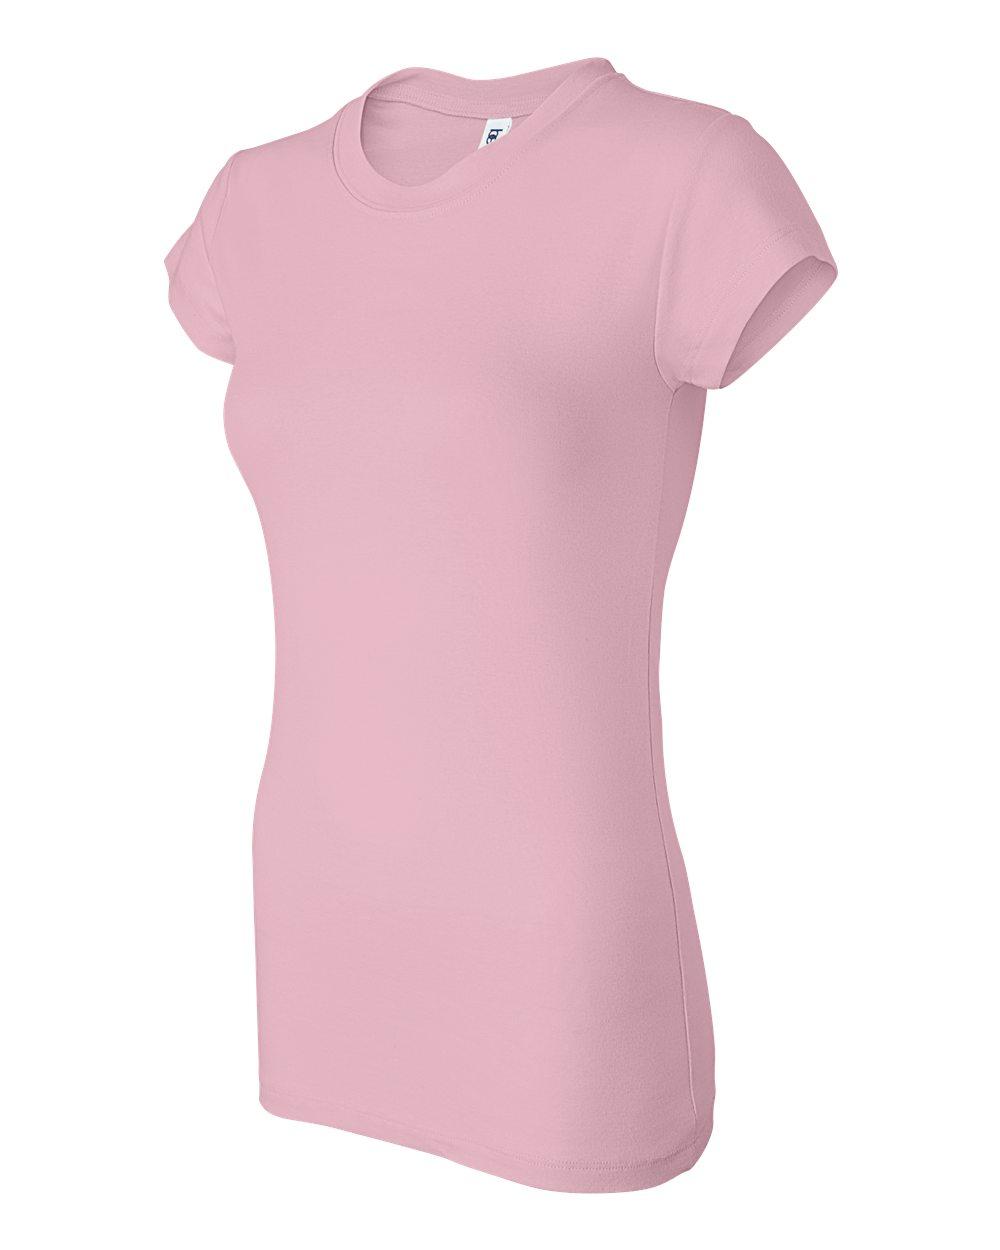 Bella 8701 Pink